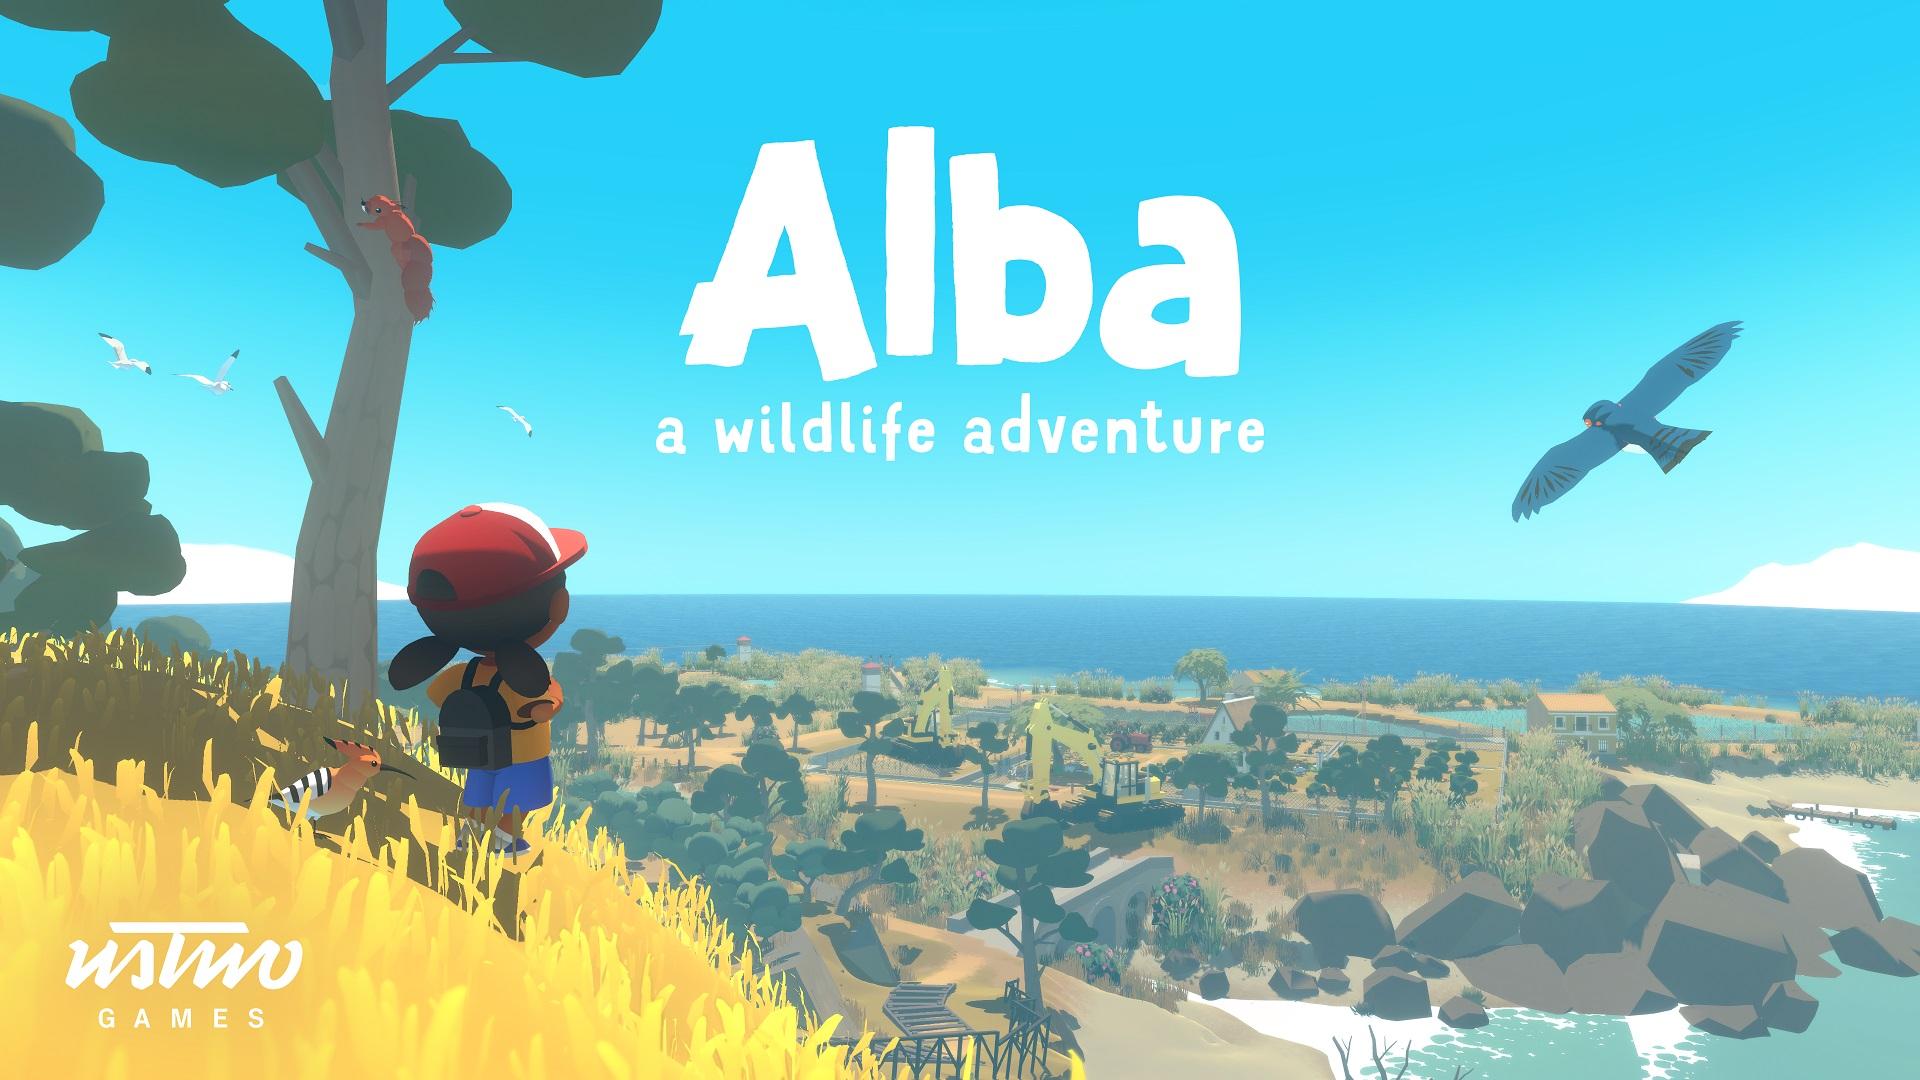 alba a wildlife adventure wallpaper 72926